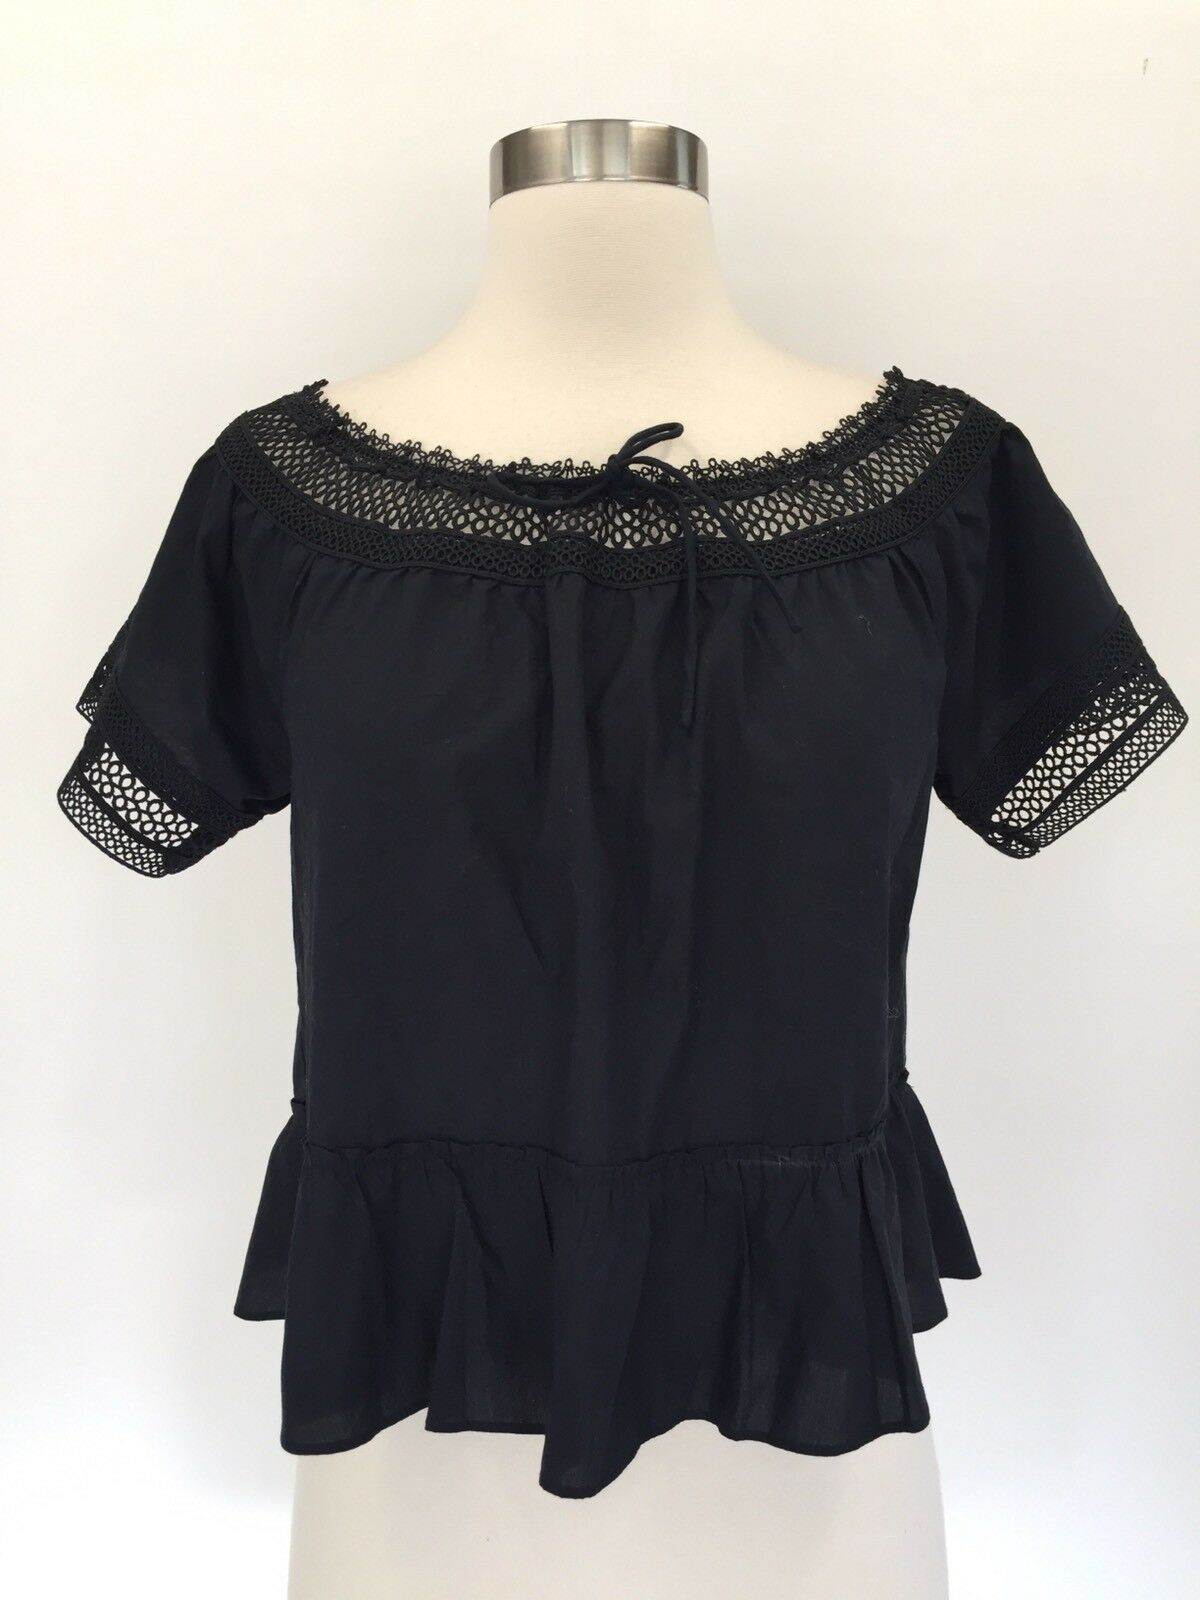 New Madewell off-the-shoulder peplum top blouse schwarz Sz L Large G7440